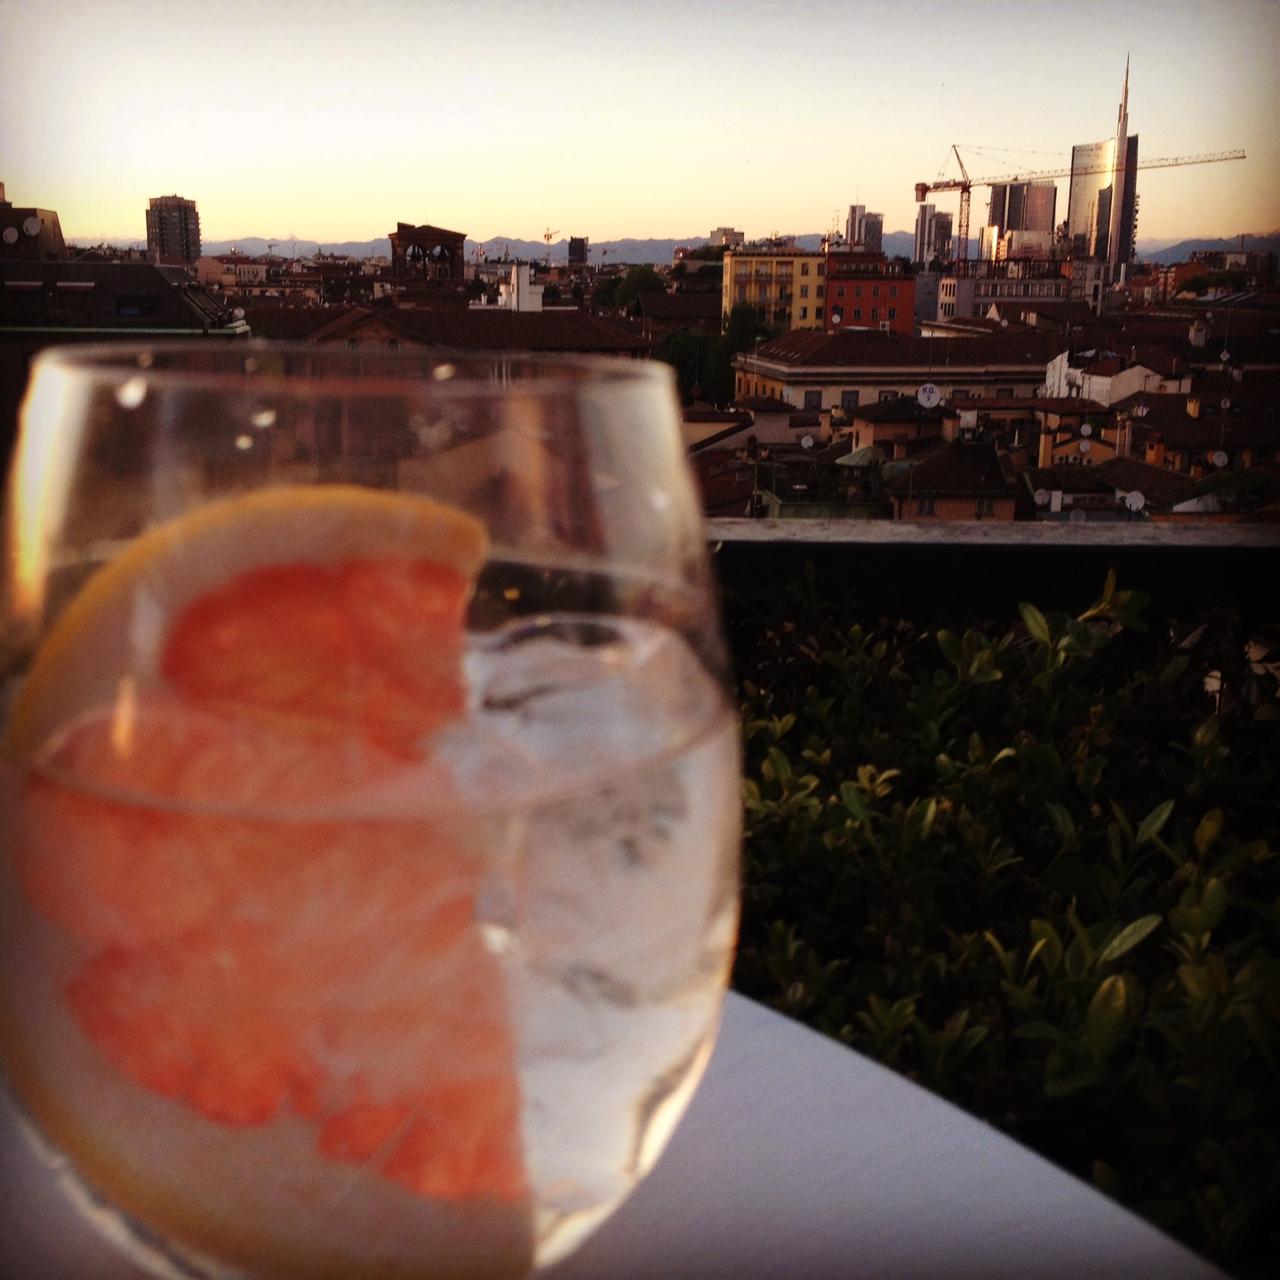 Gin tonic @oltreilbalcone